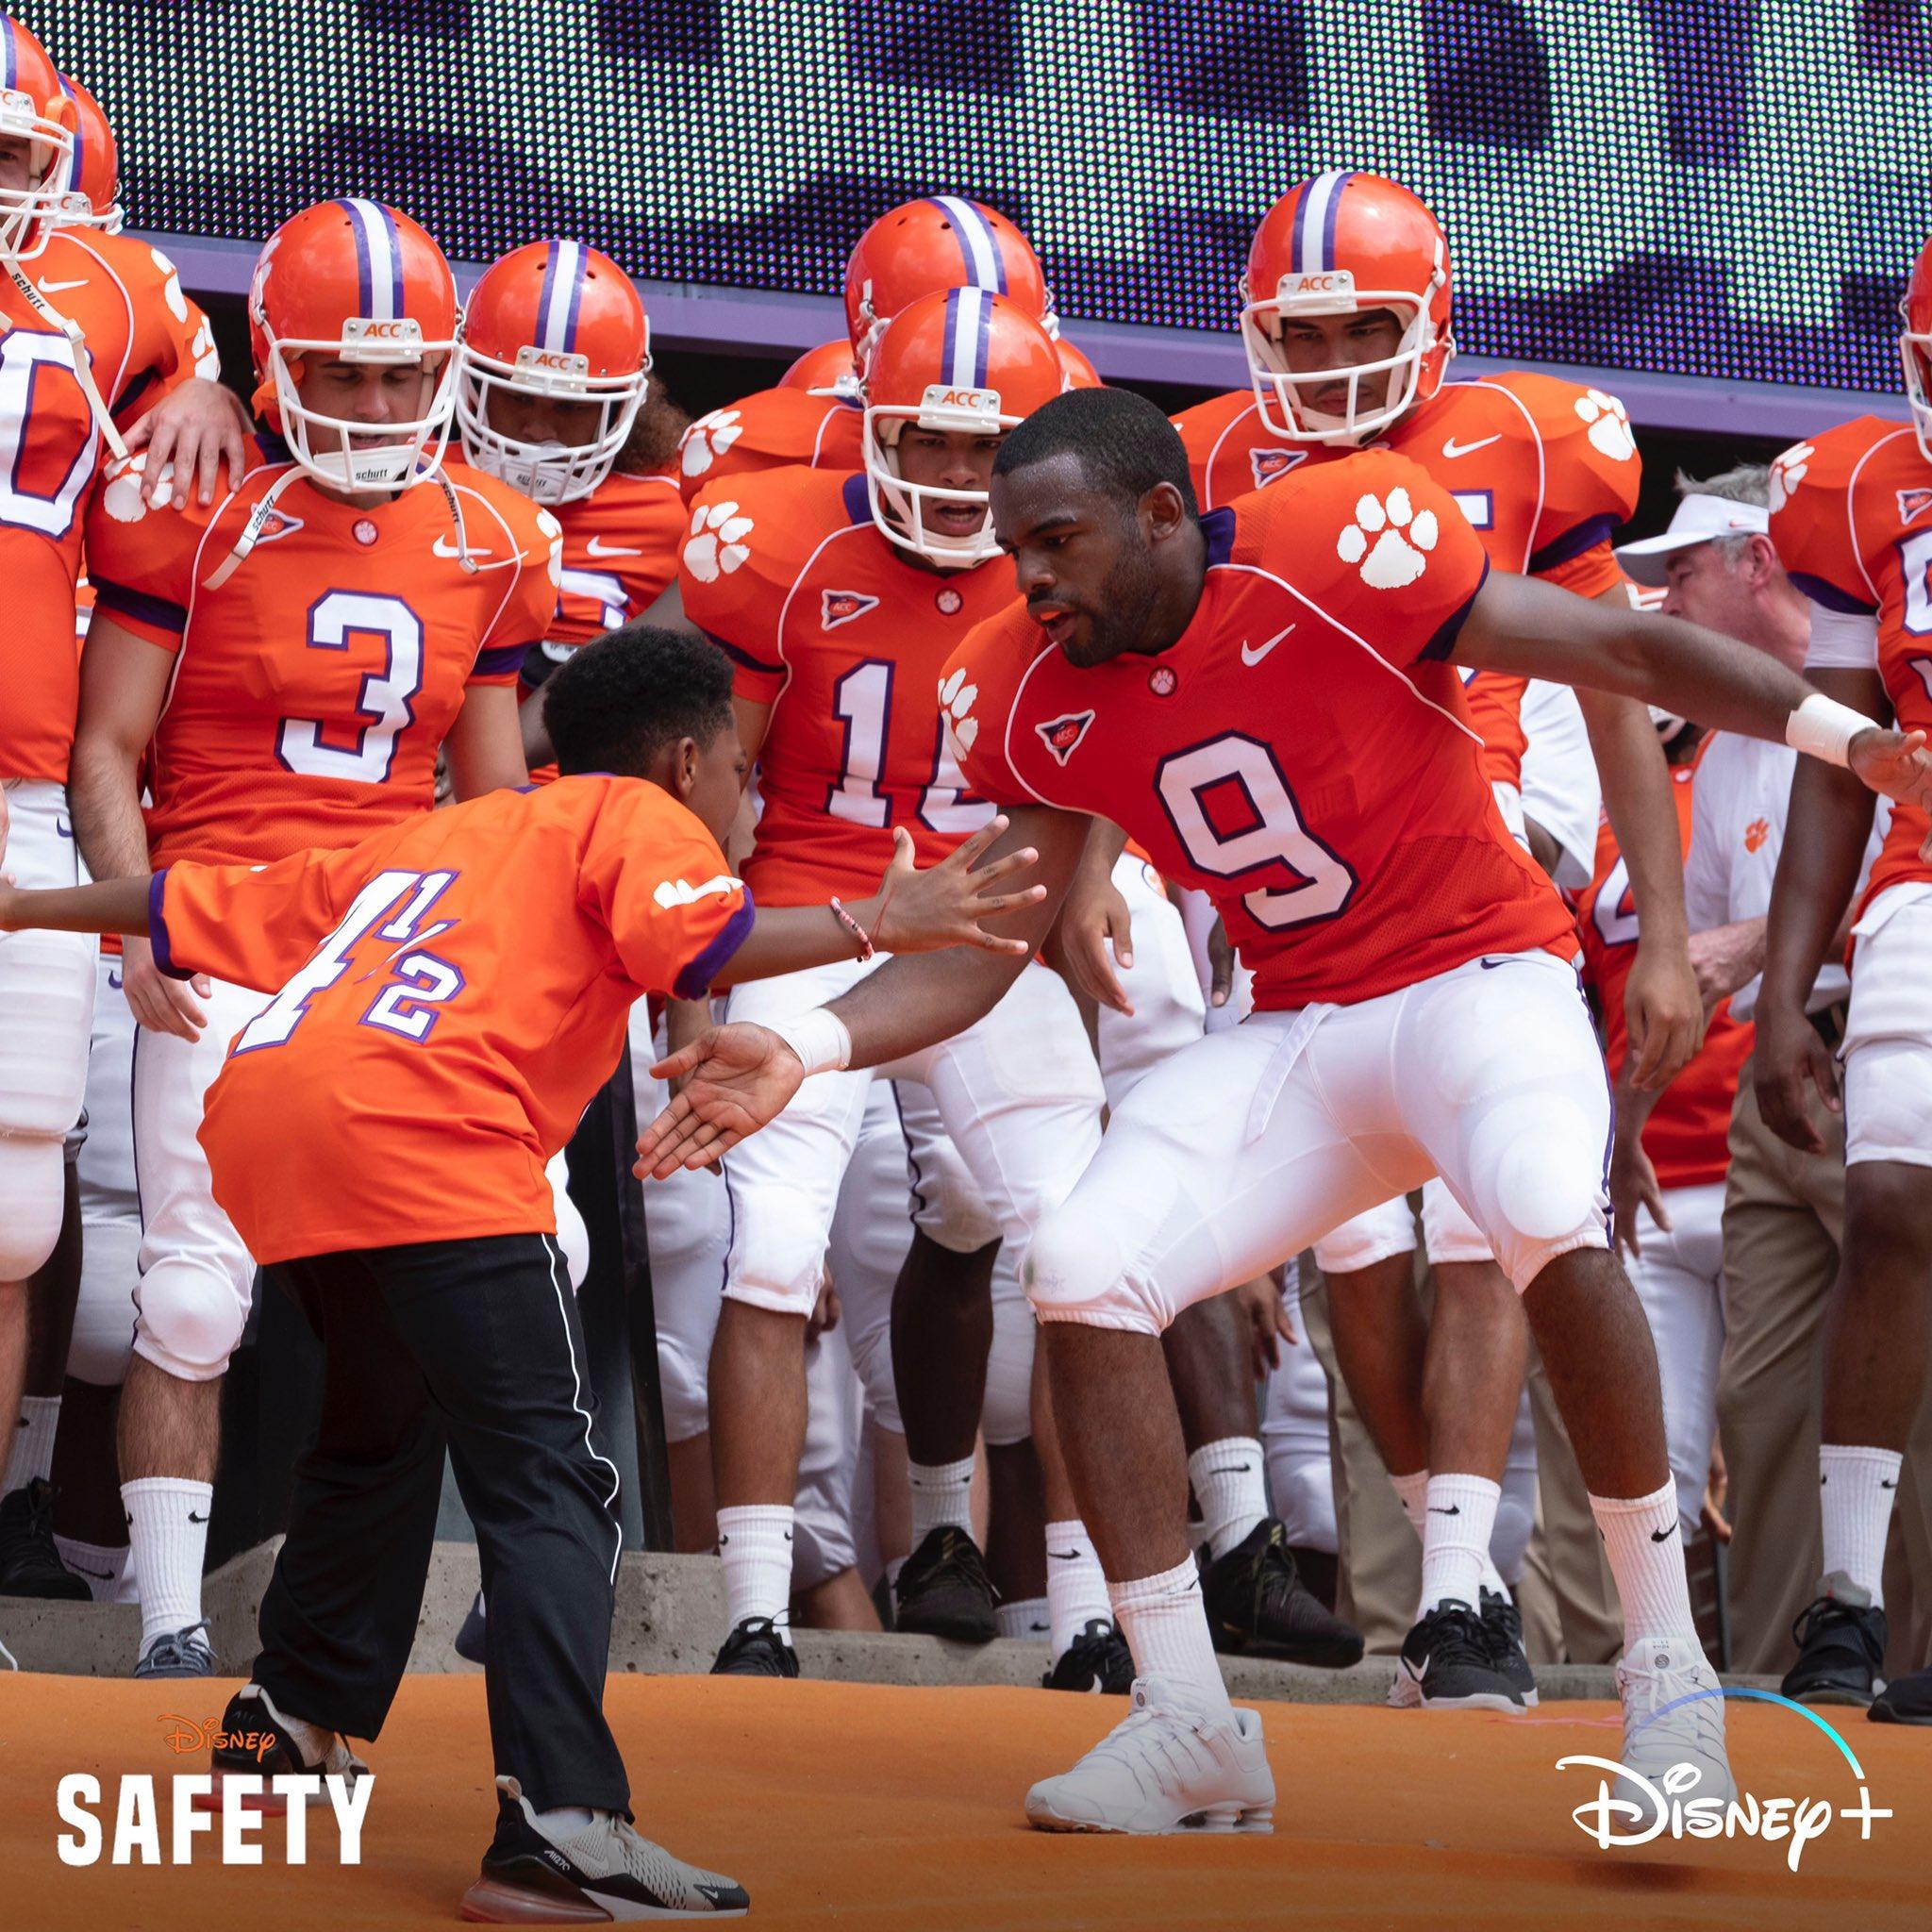 Safety [Disney - 2020] Emk5B3nXUAA_HJN?format=jpg&name=large